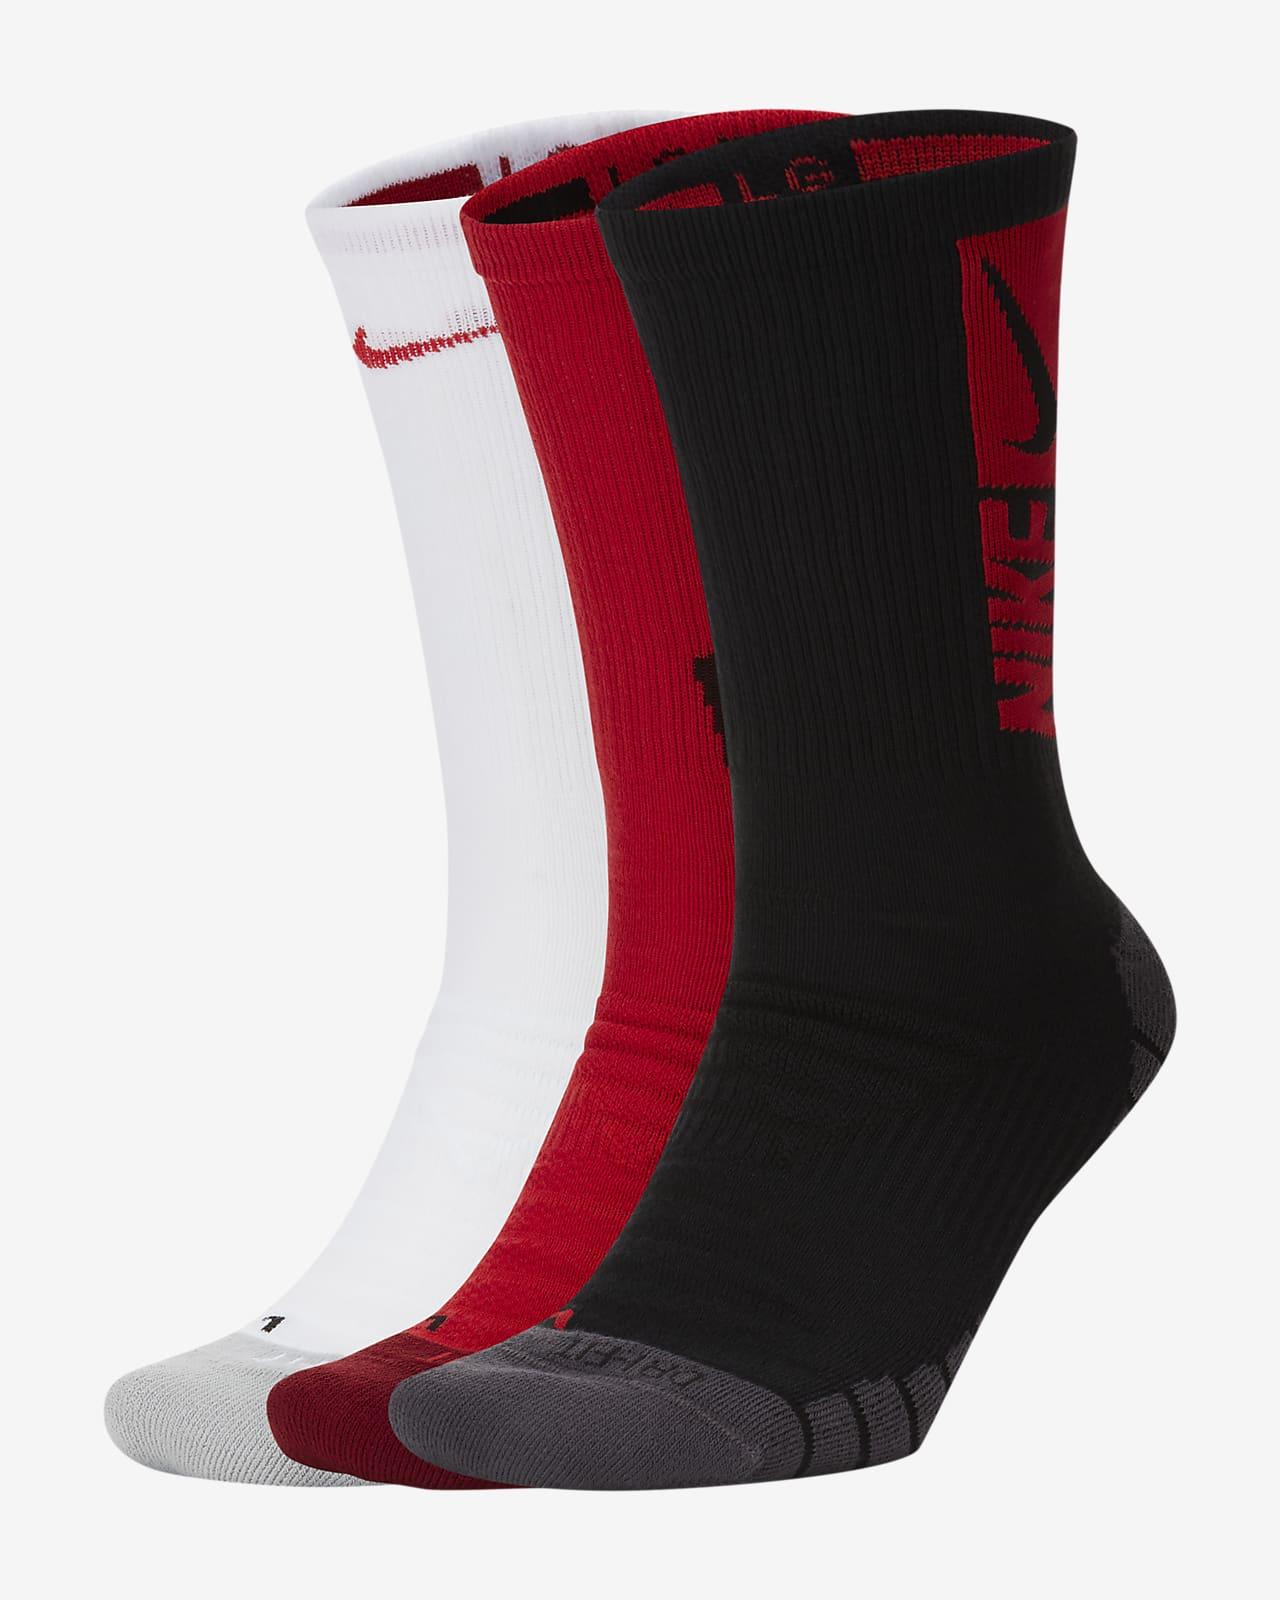 Nike Everyday Max Cushioned Training Crew Socks (3 Pairs)